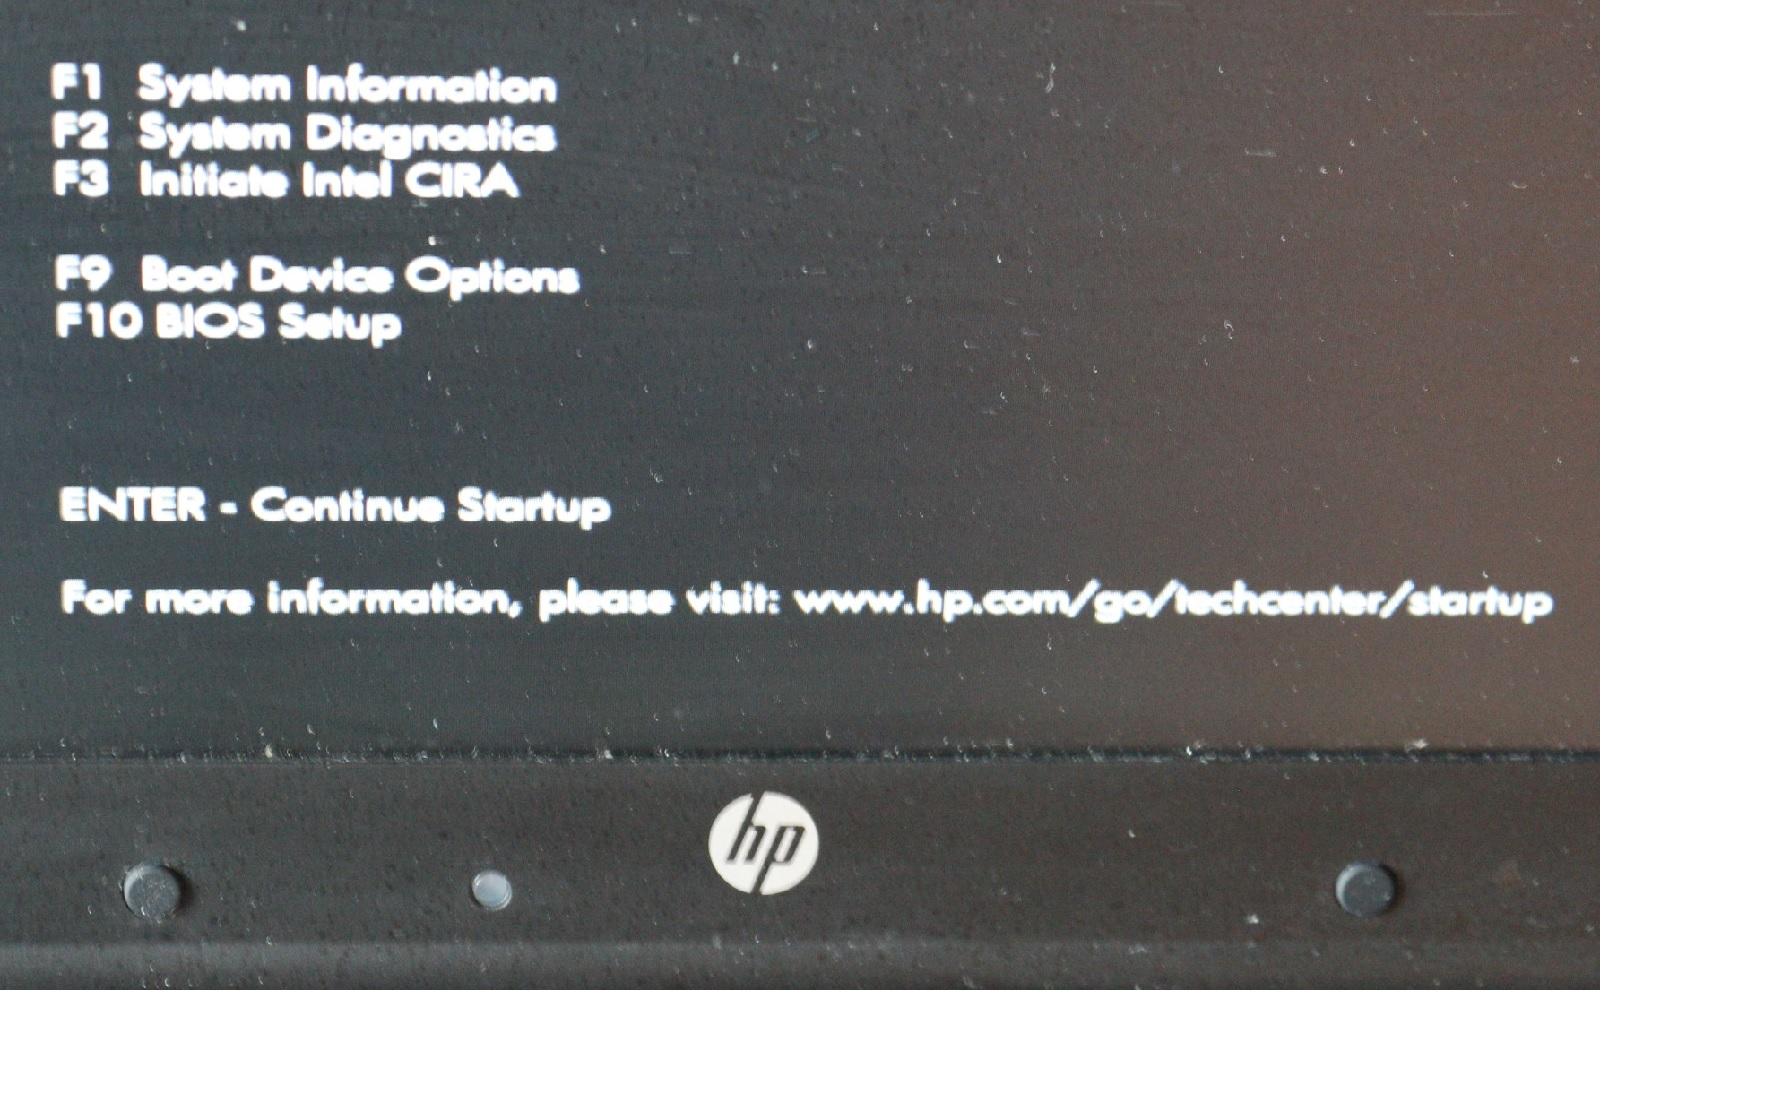 HP Elitebook 8460p - HP Support Community - 6202510